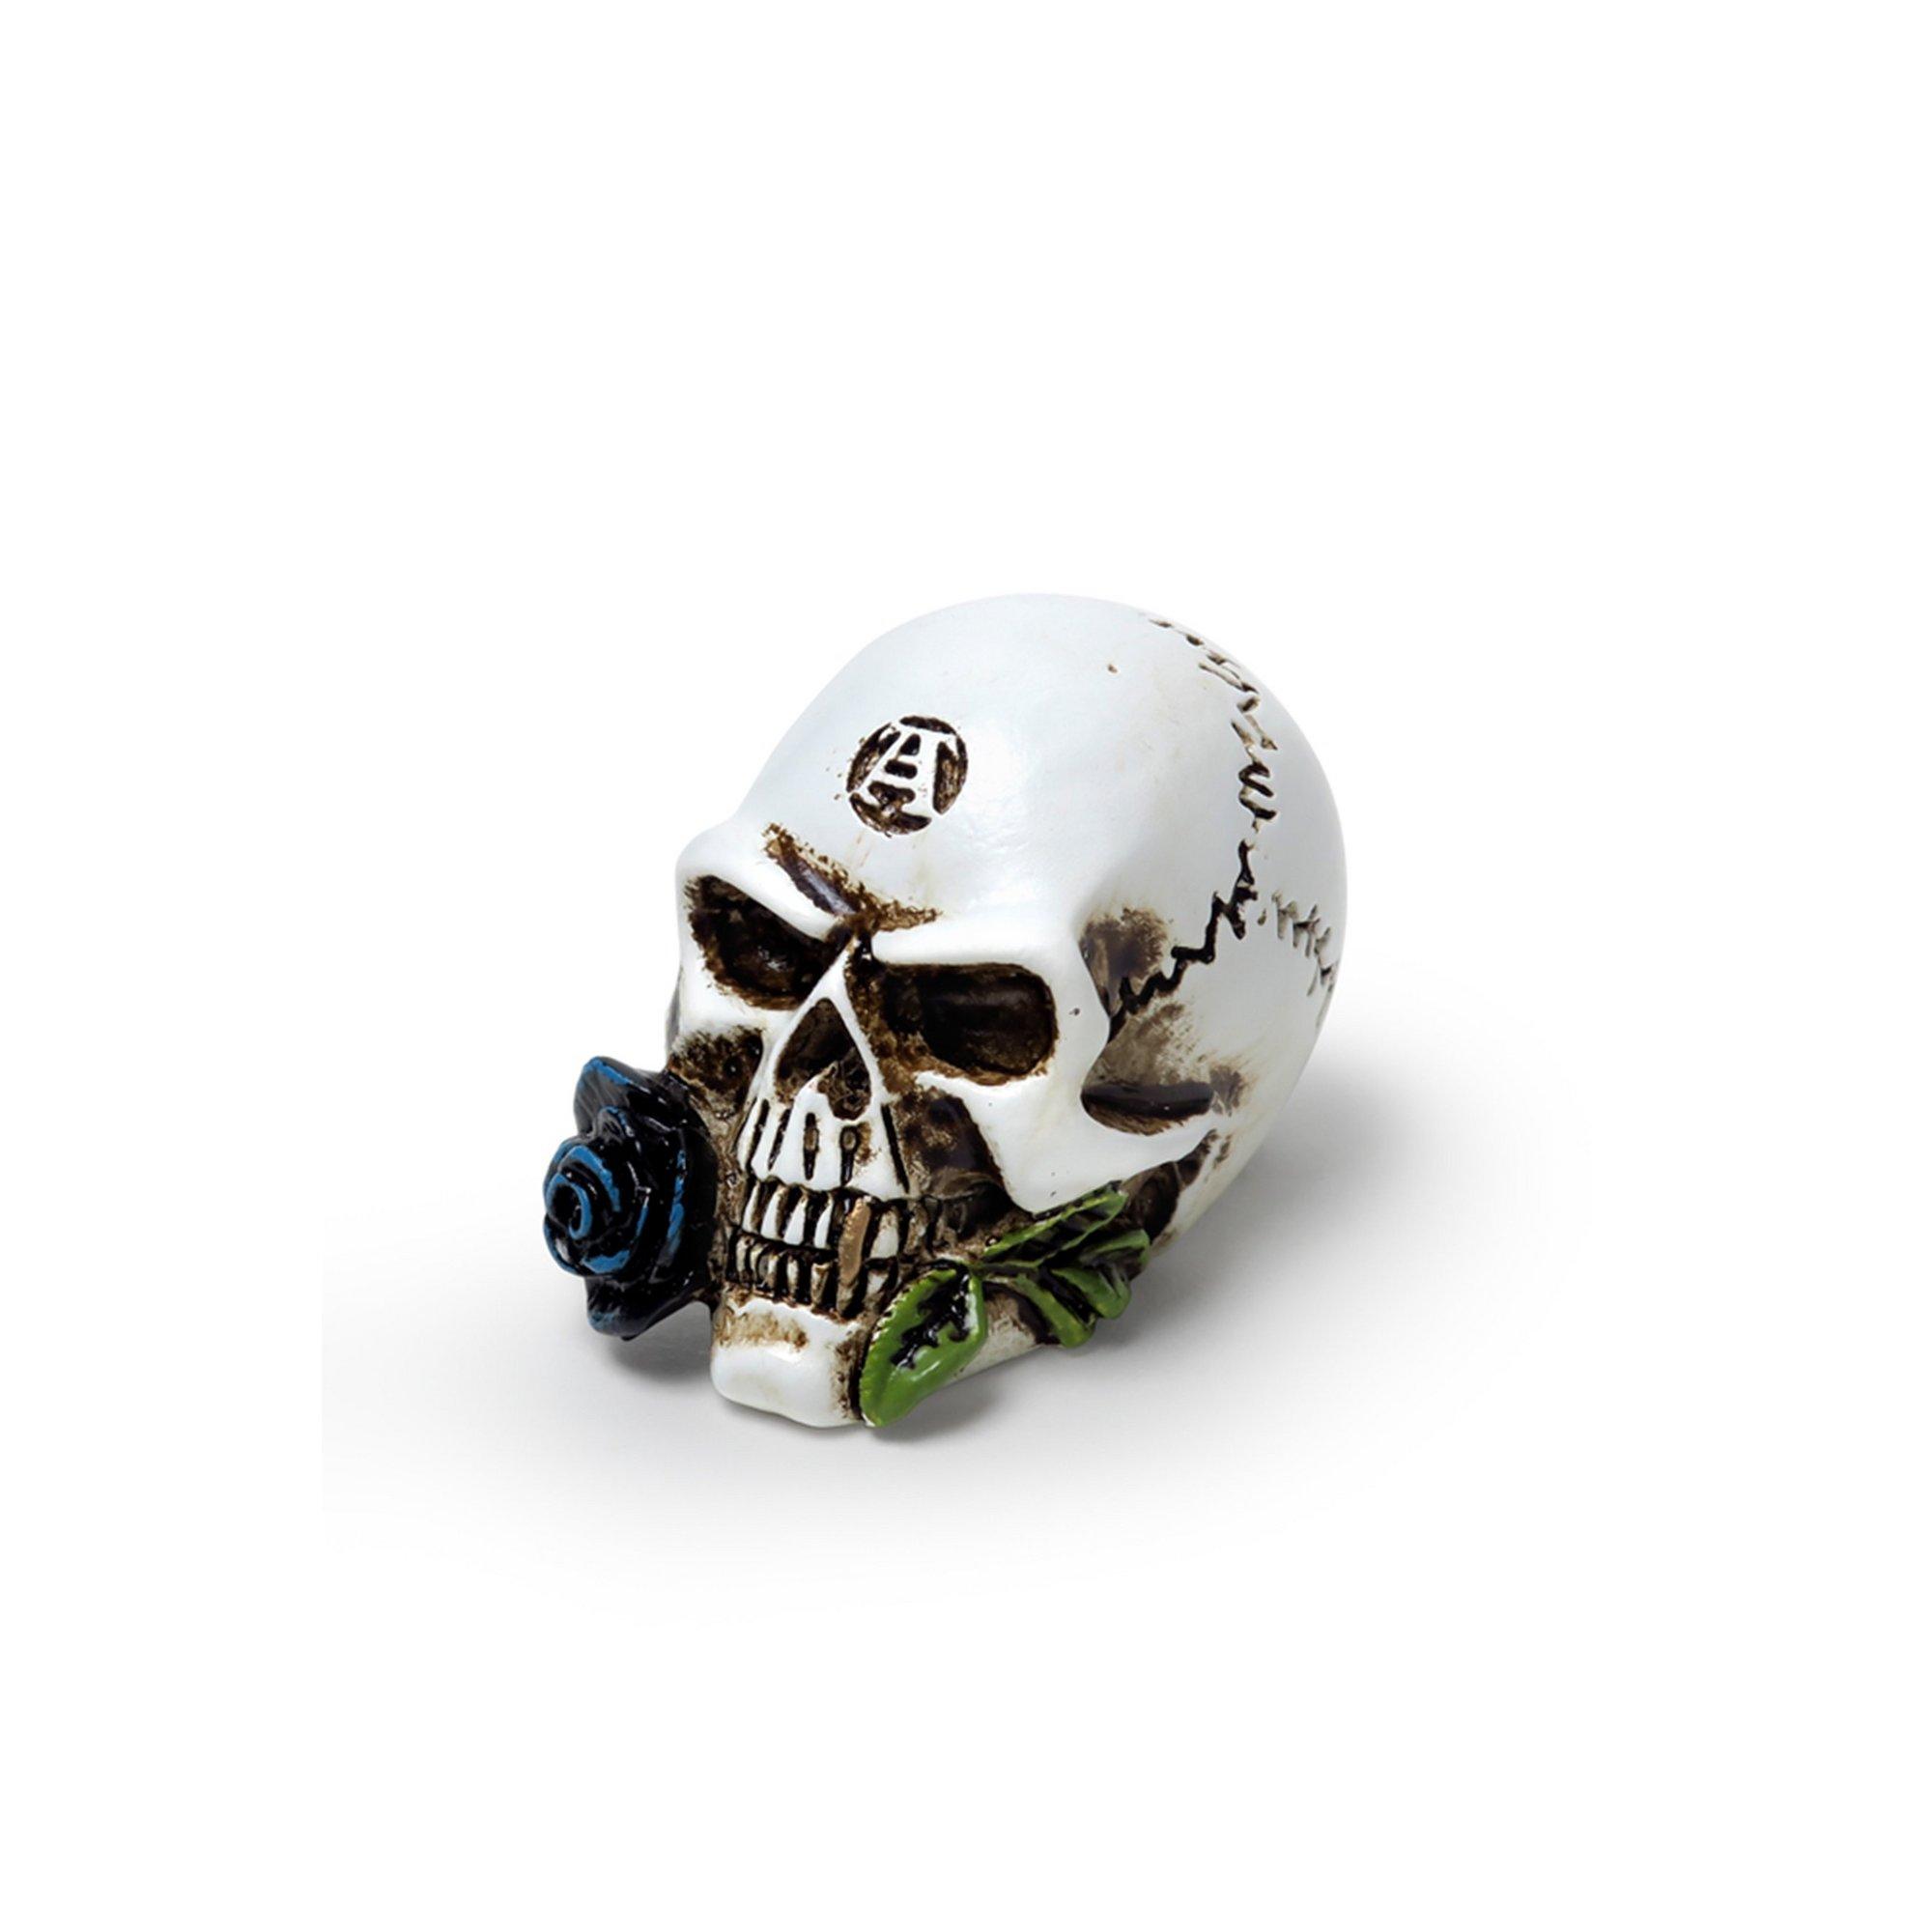 Image of Alchemist Skull: Miniture Ornament